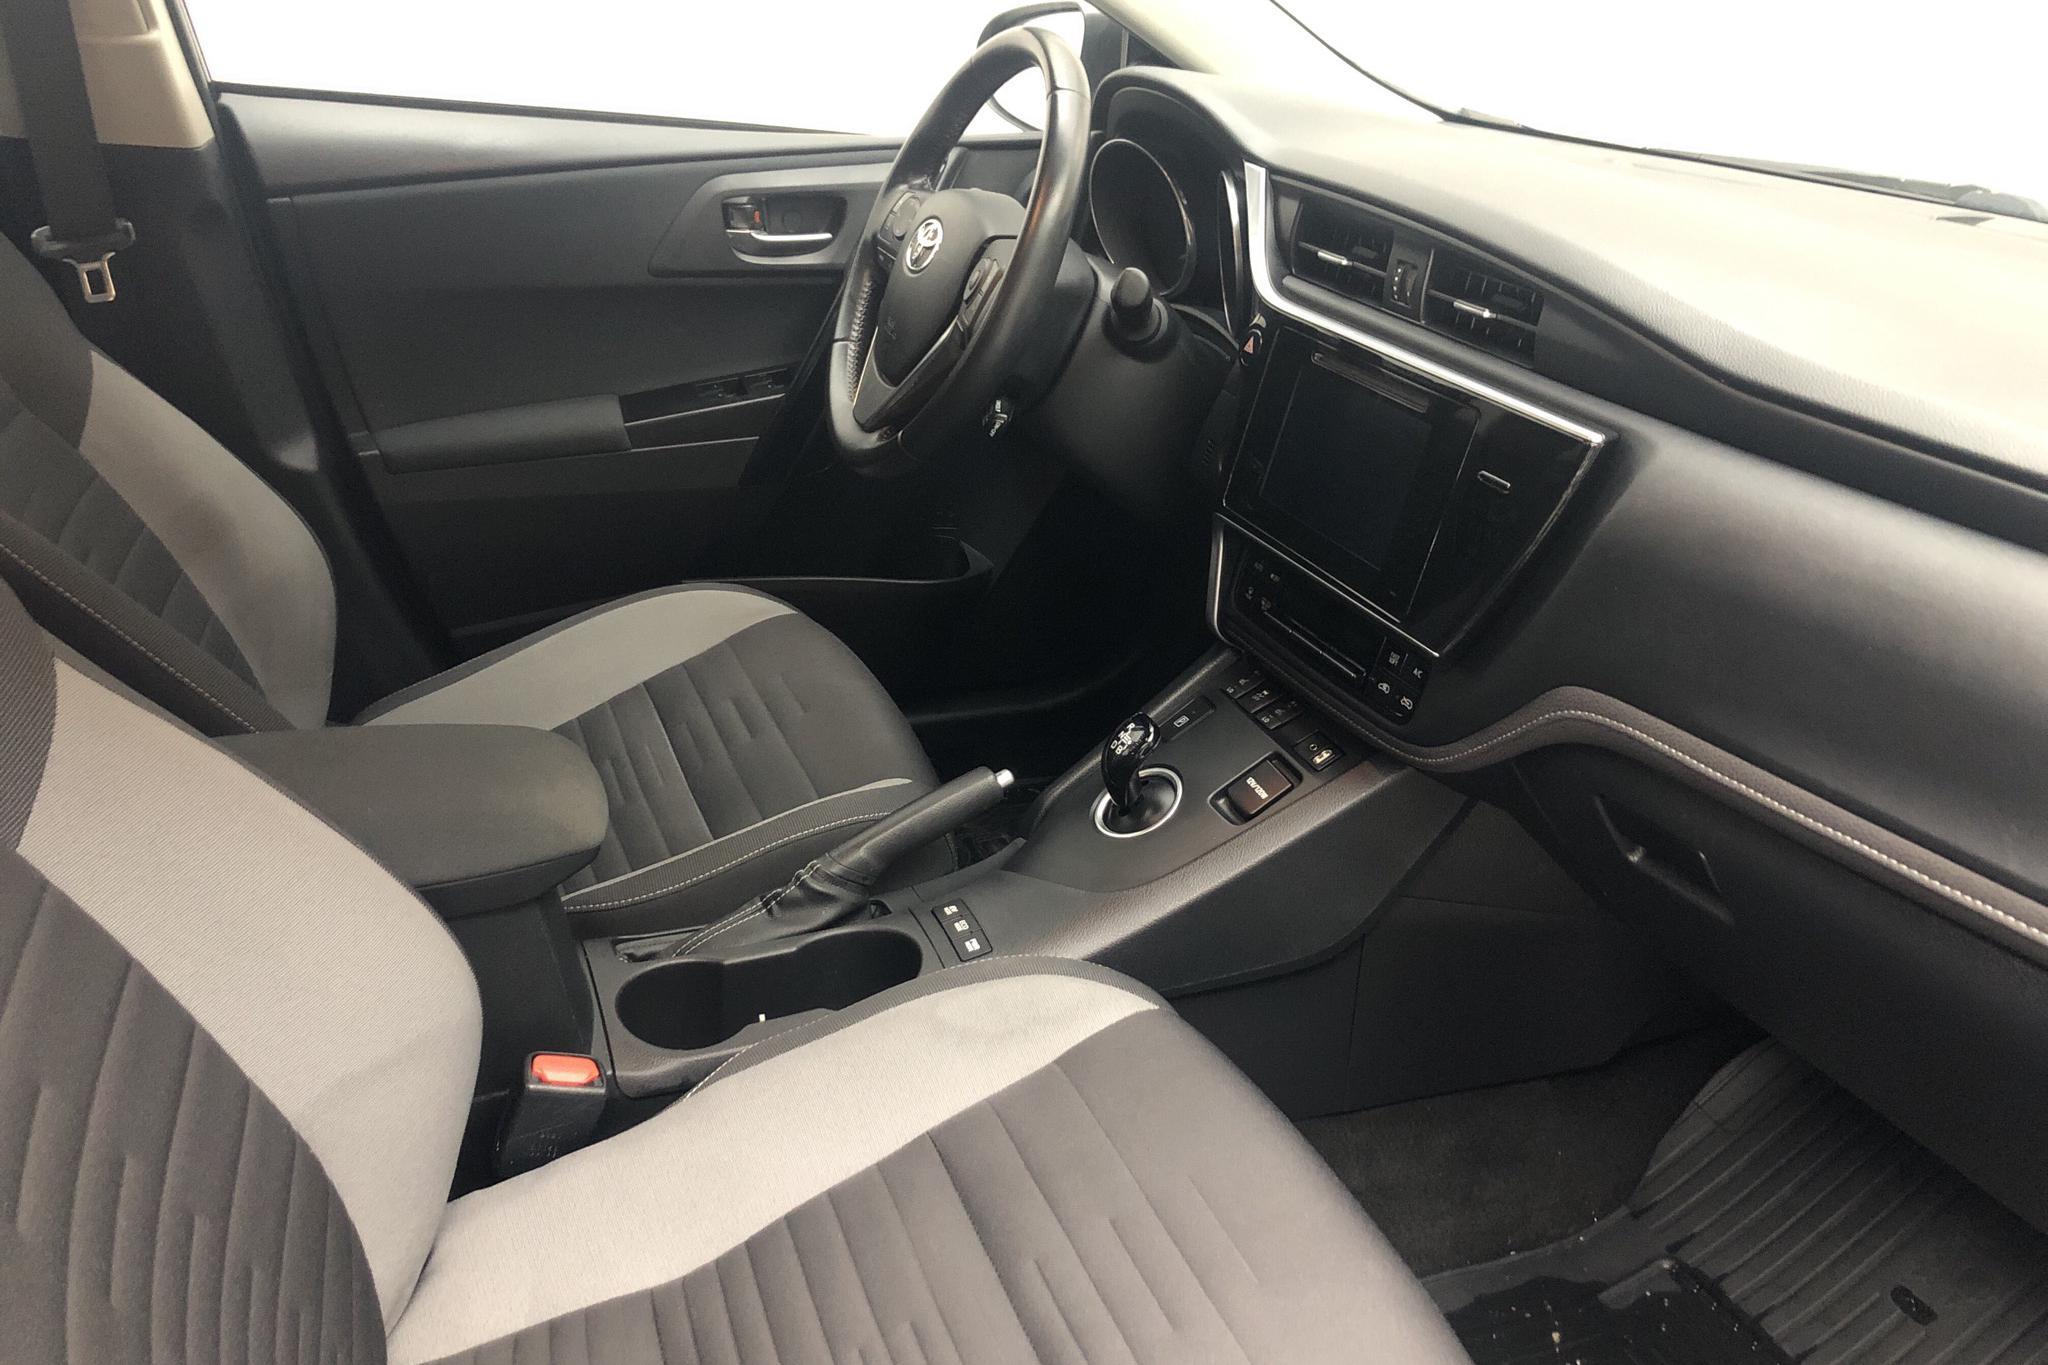 Toyota Auris 1.8 HSD Touring Sports (99hk) - 92 650 km - Automatic - Dark Blue - 2017